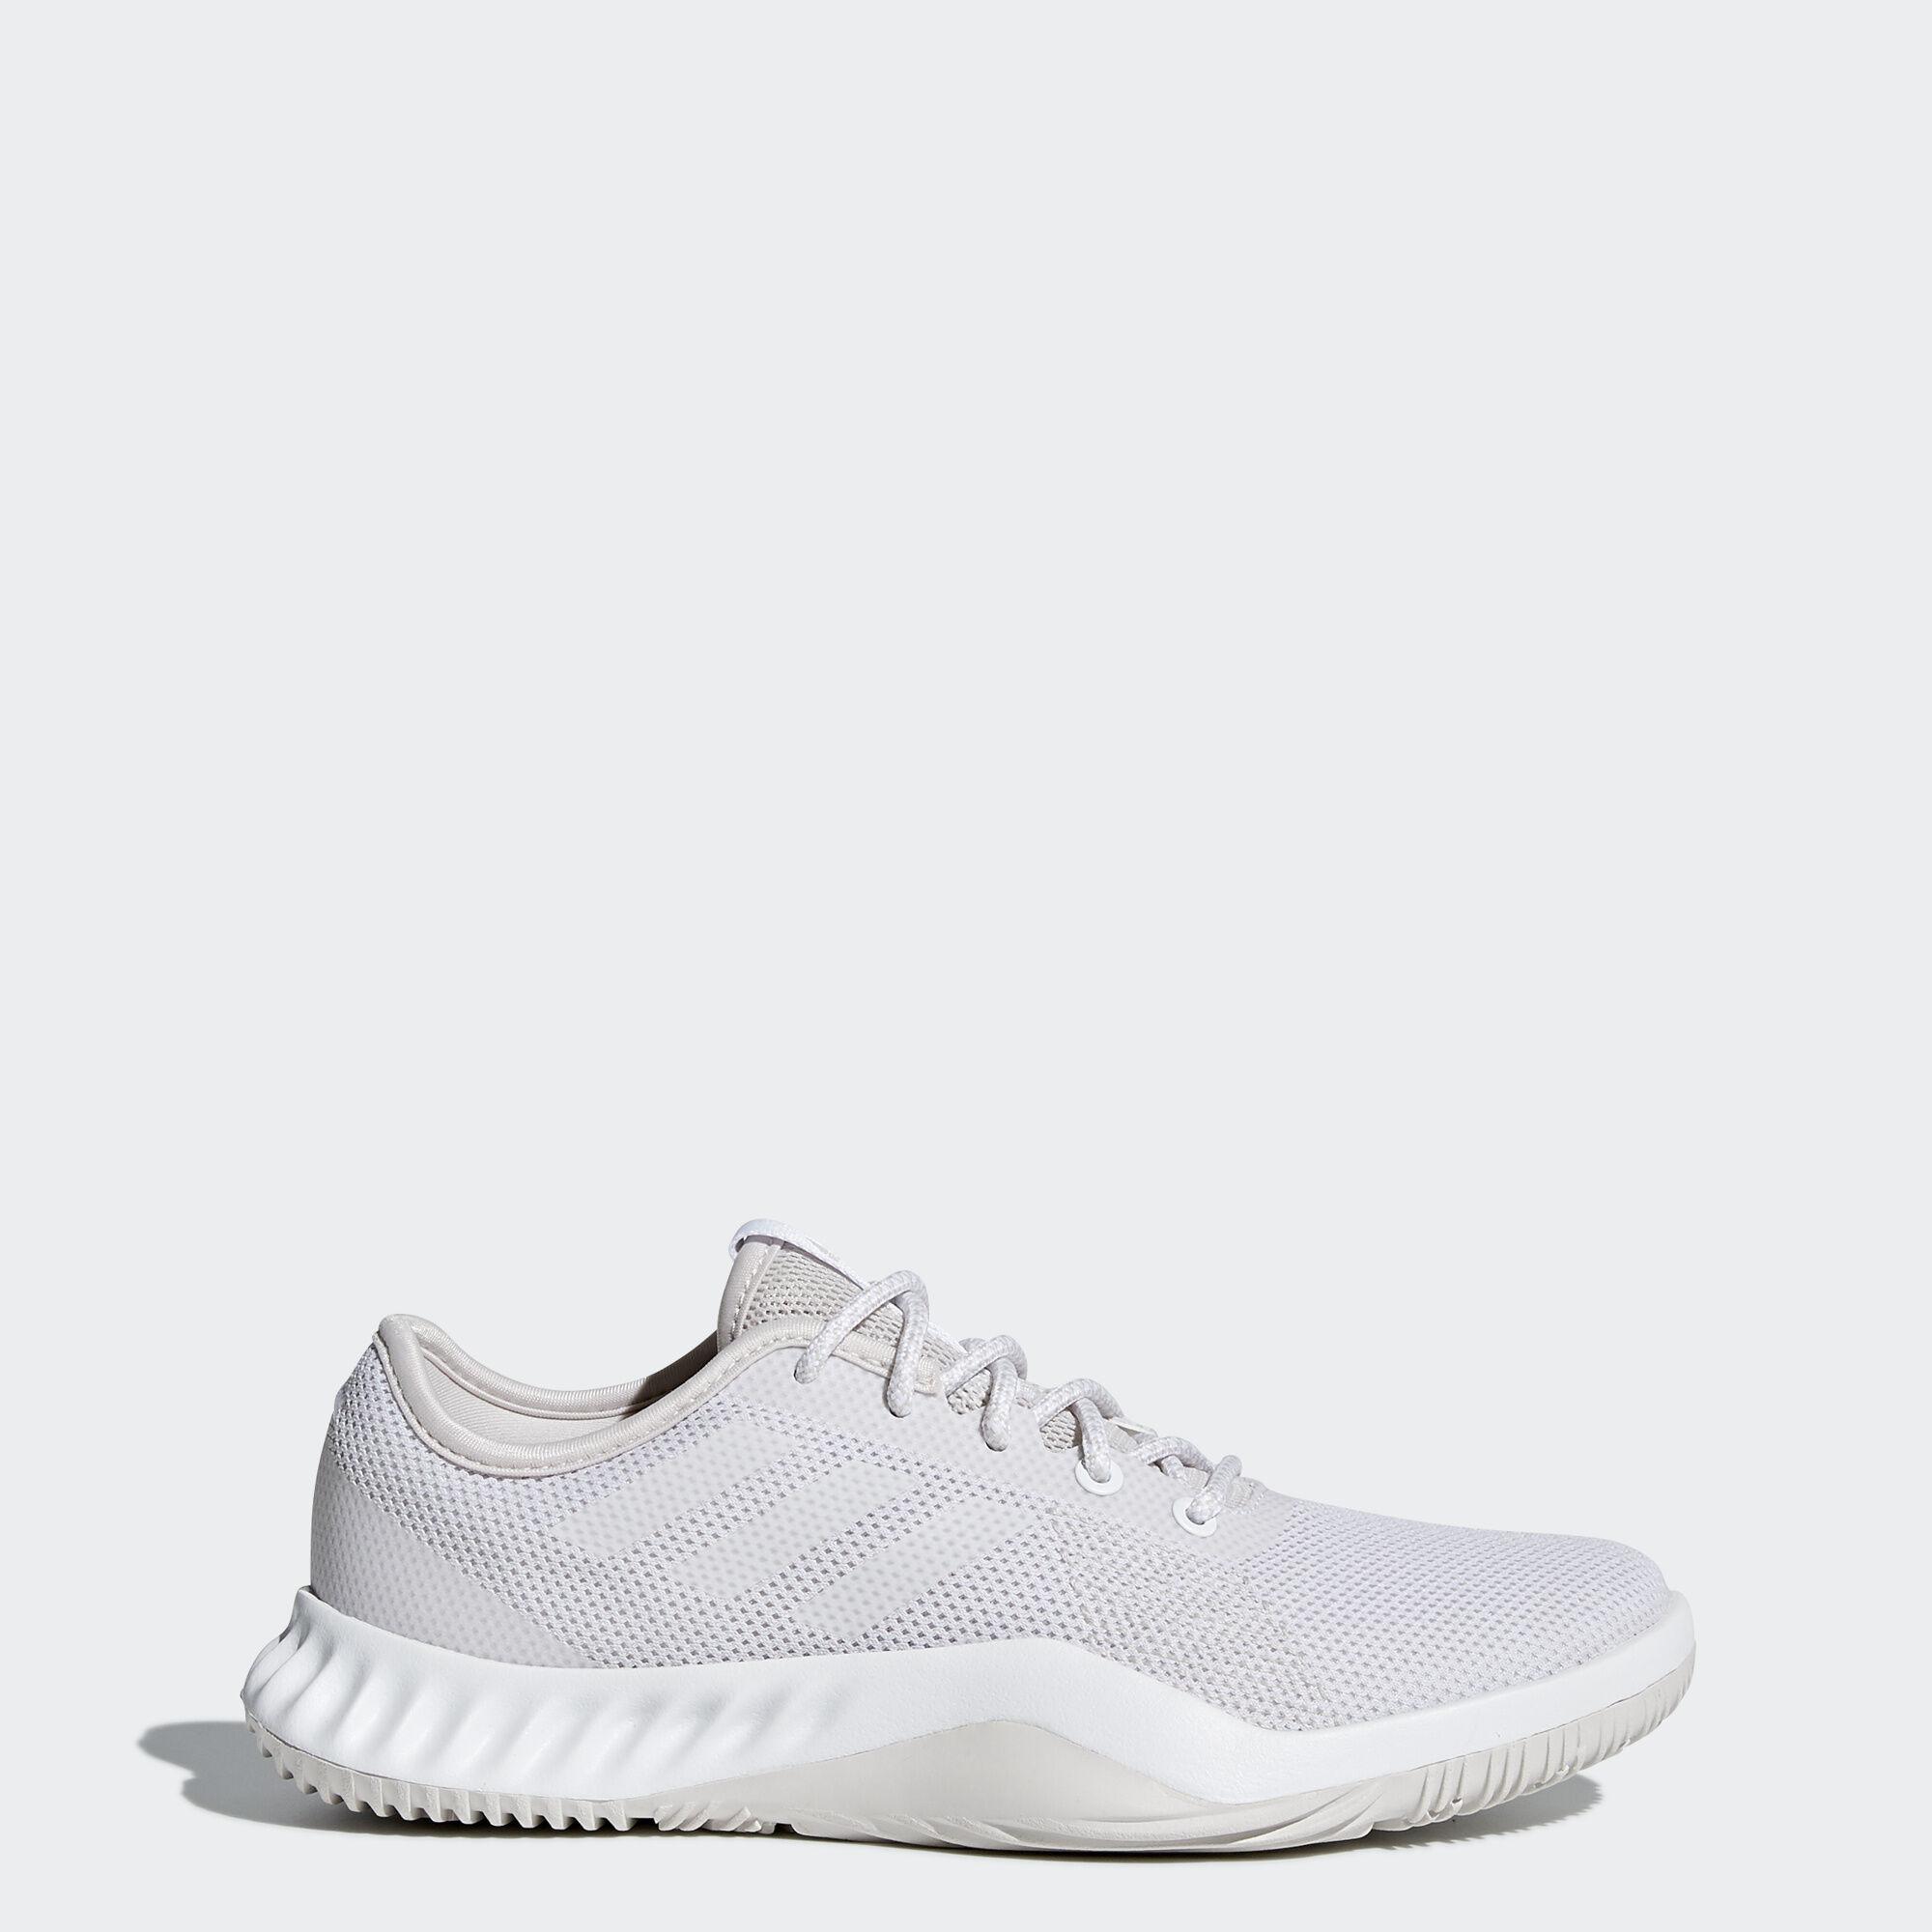 adidas - CrazyTrain LT Shoes Chalk Pearl/Ftwr White/Chalk Pearl CG3498 ...